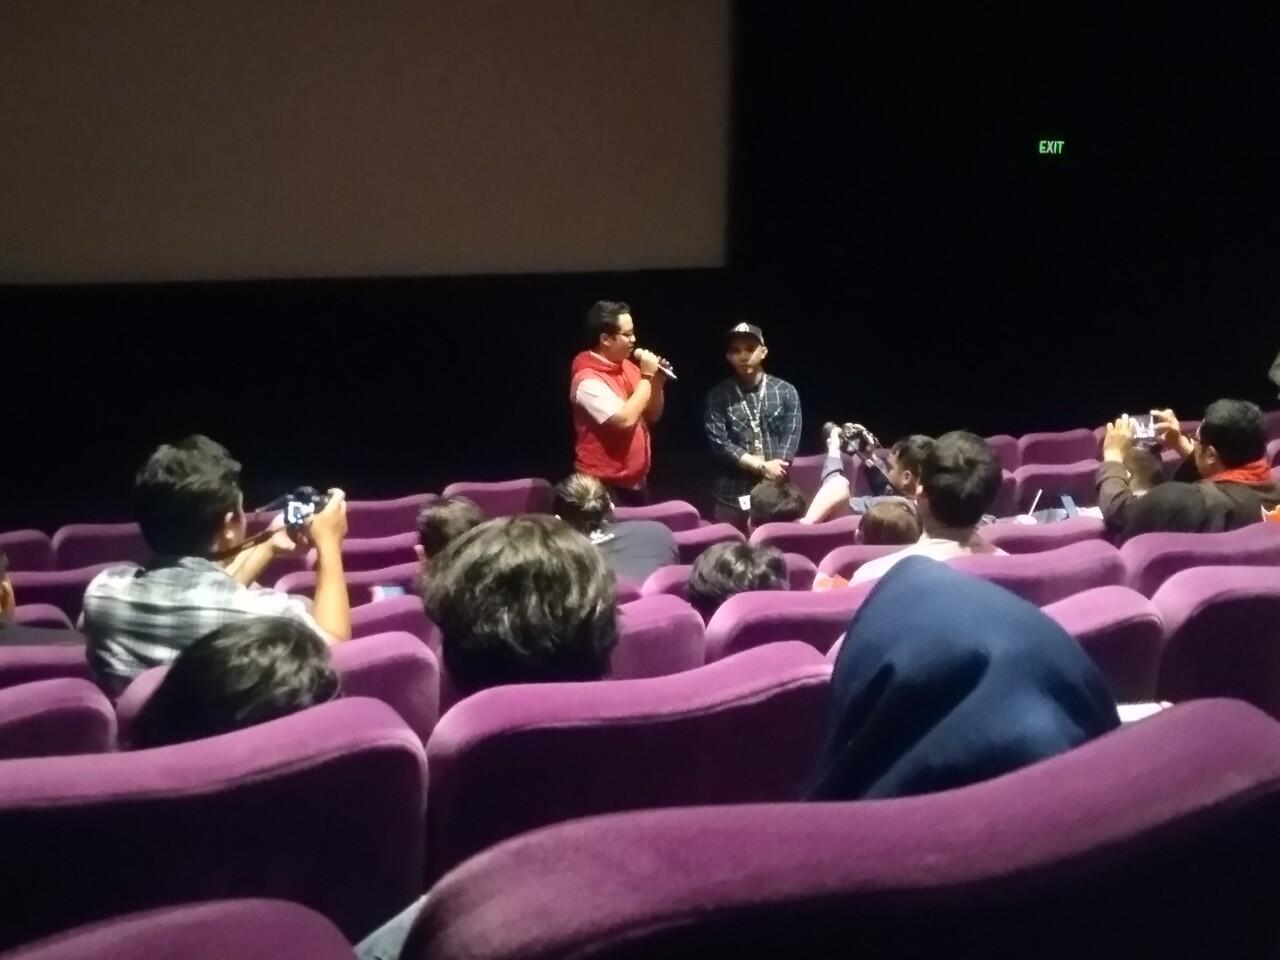 [FR]Serba Merah dan Hitam di KASKUS Movie Night Out, Ant-Man and The Wasp